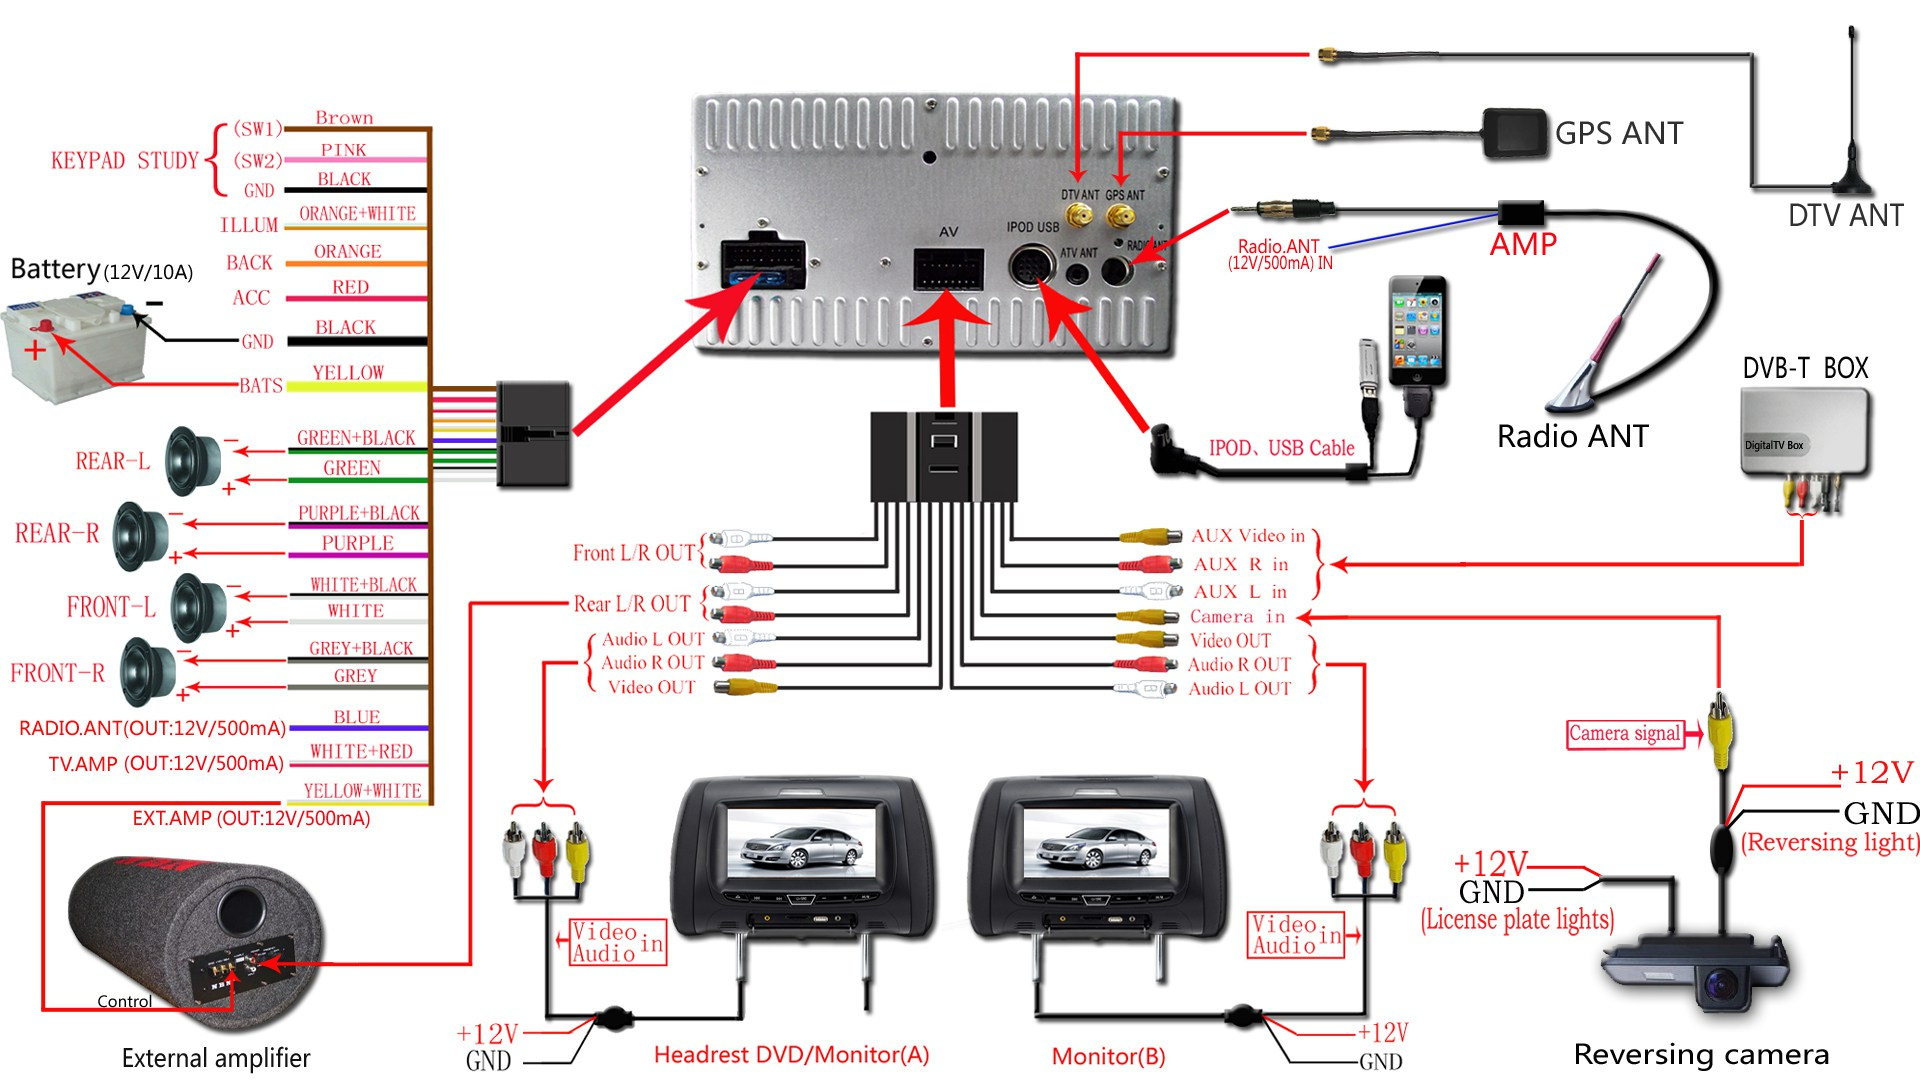 Audio Wire Diagram - Wiring Diagram Data Oreo - 2003 Ford Explorer Radio Wiring Diagram